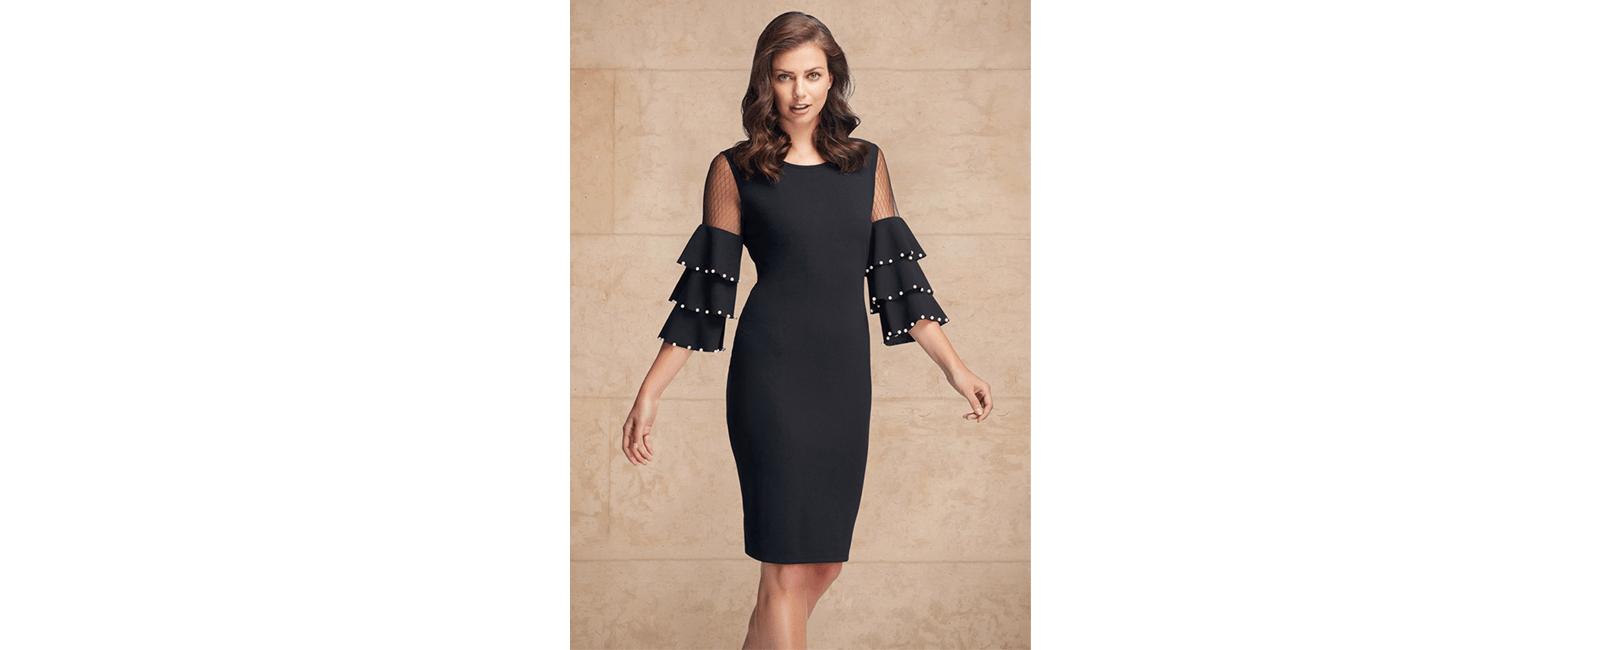 clothing-dress